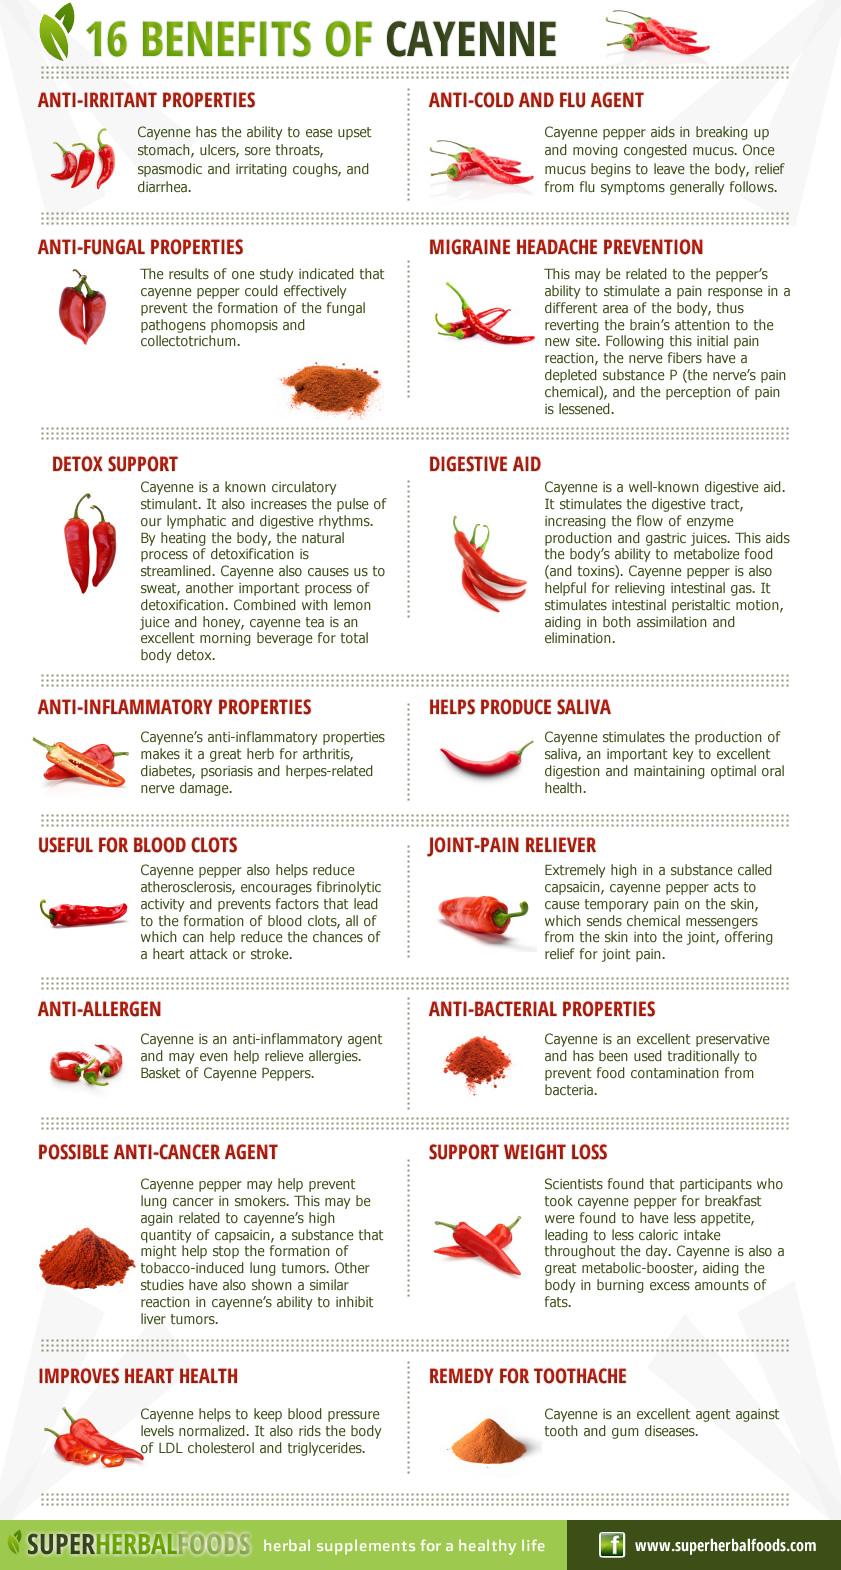 Super Herbal Foods Natural Remedies 16 Benefits Of